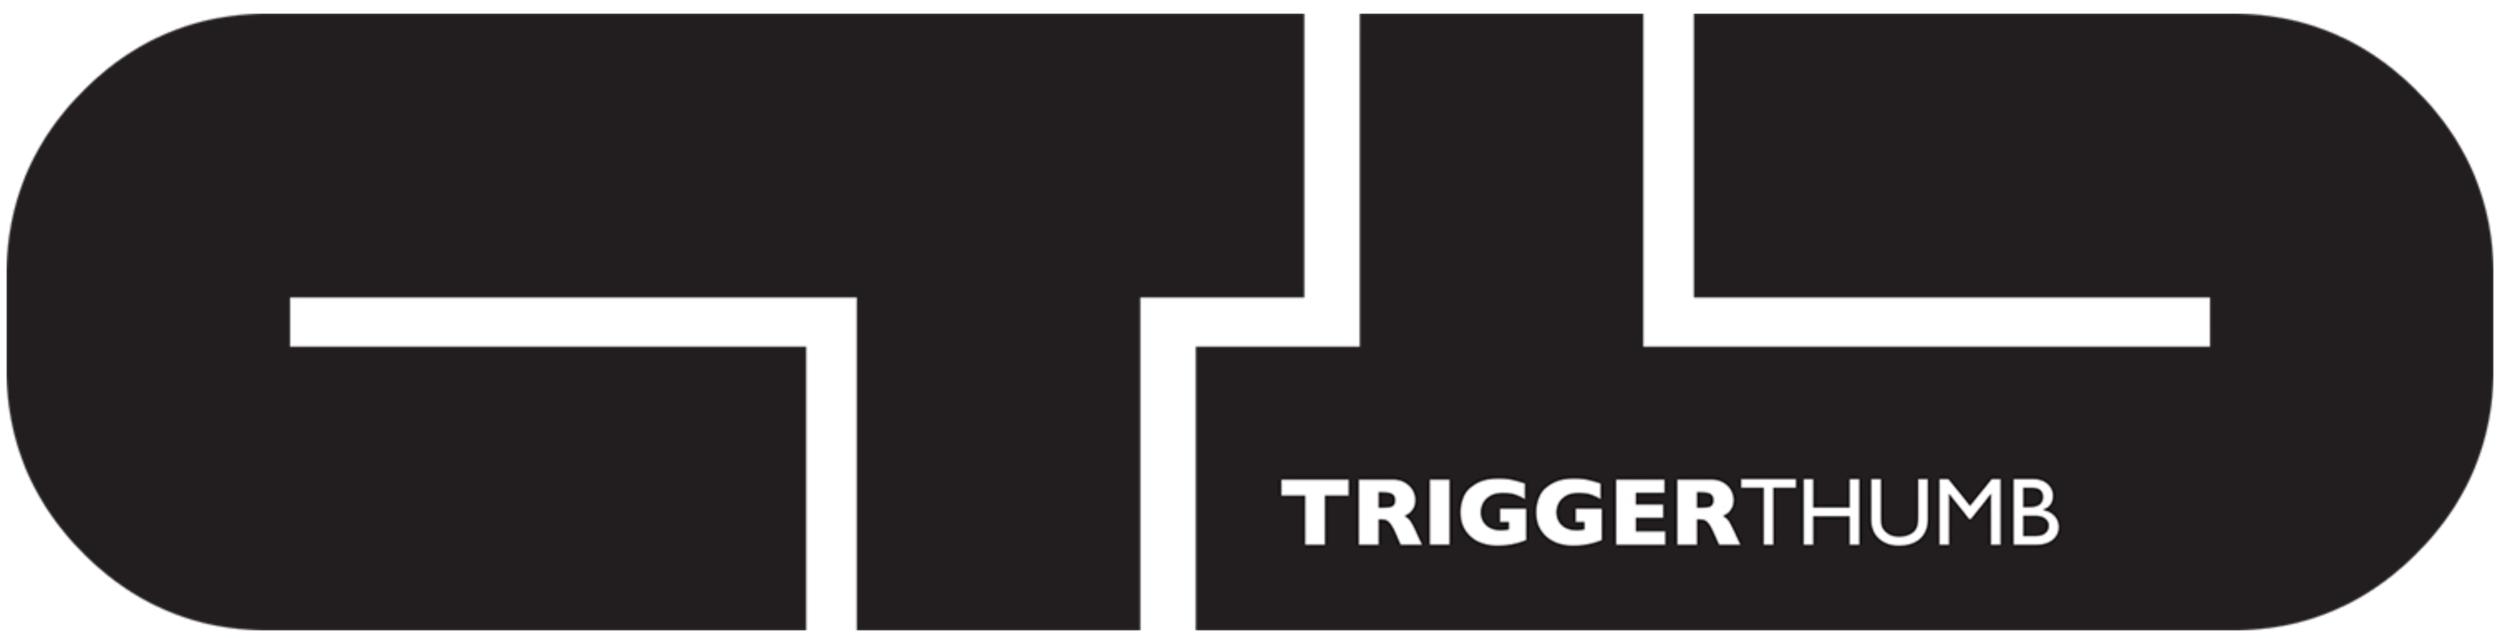 Trigger Thumb Logo 1080.png